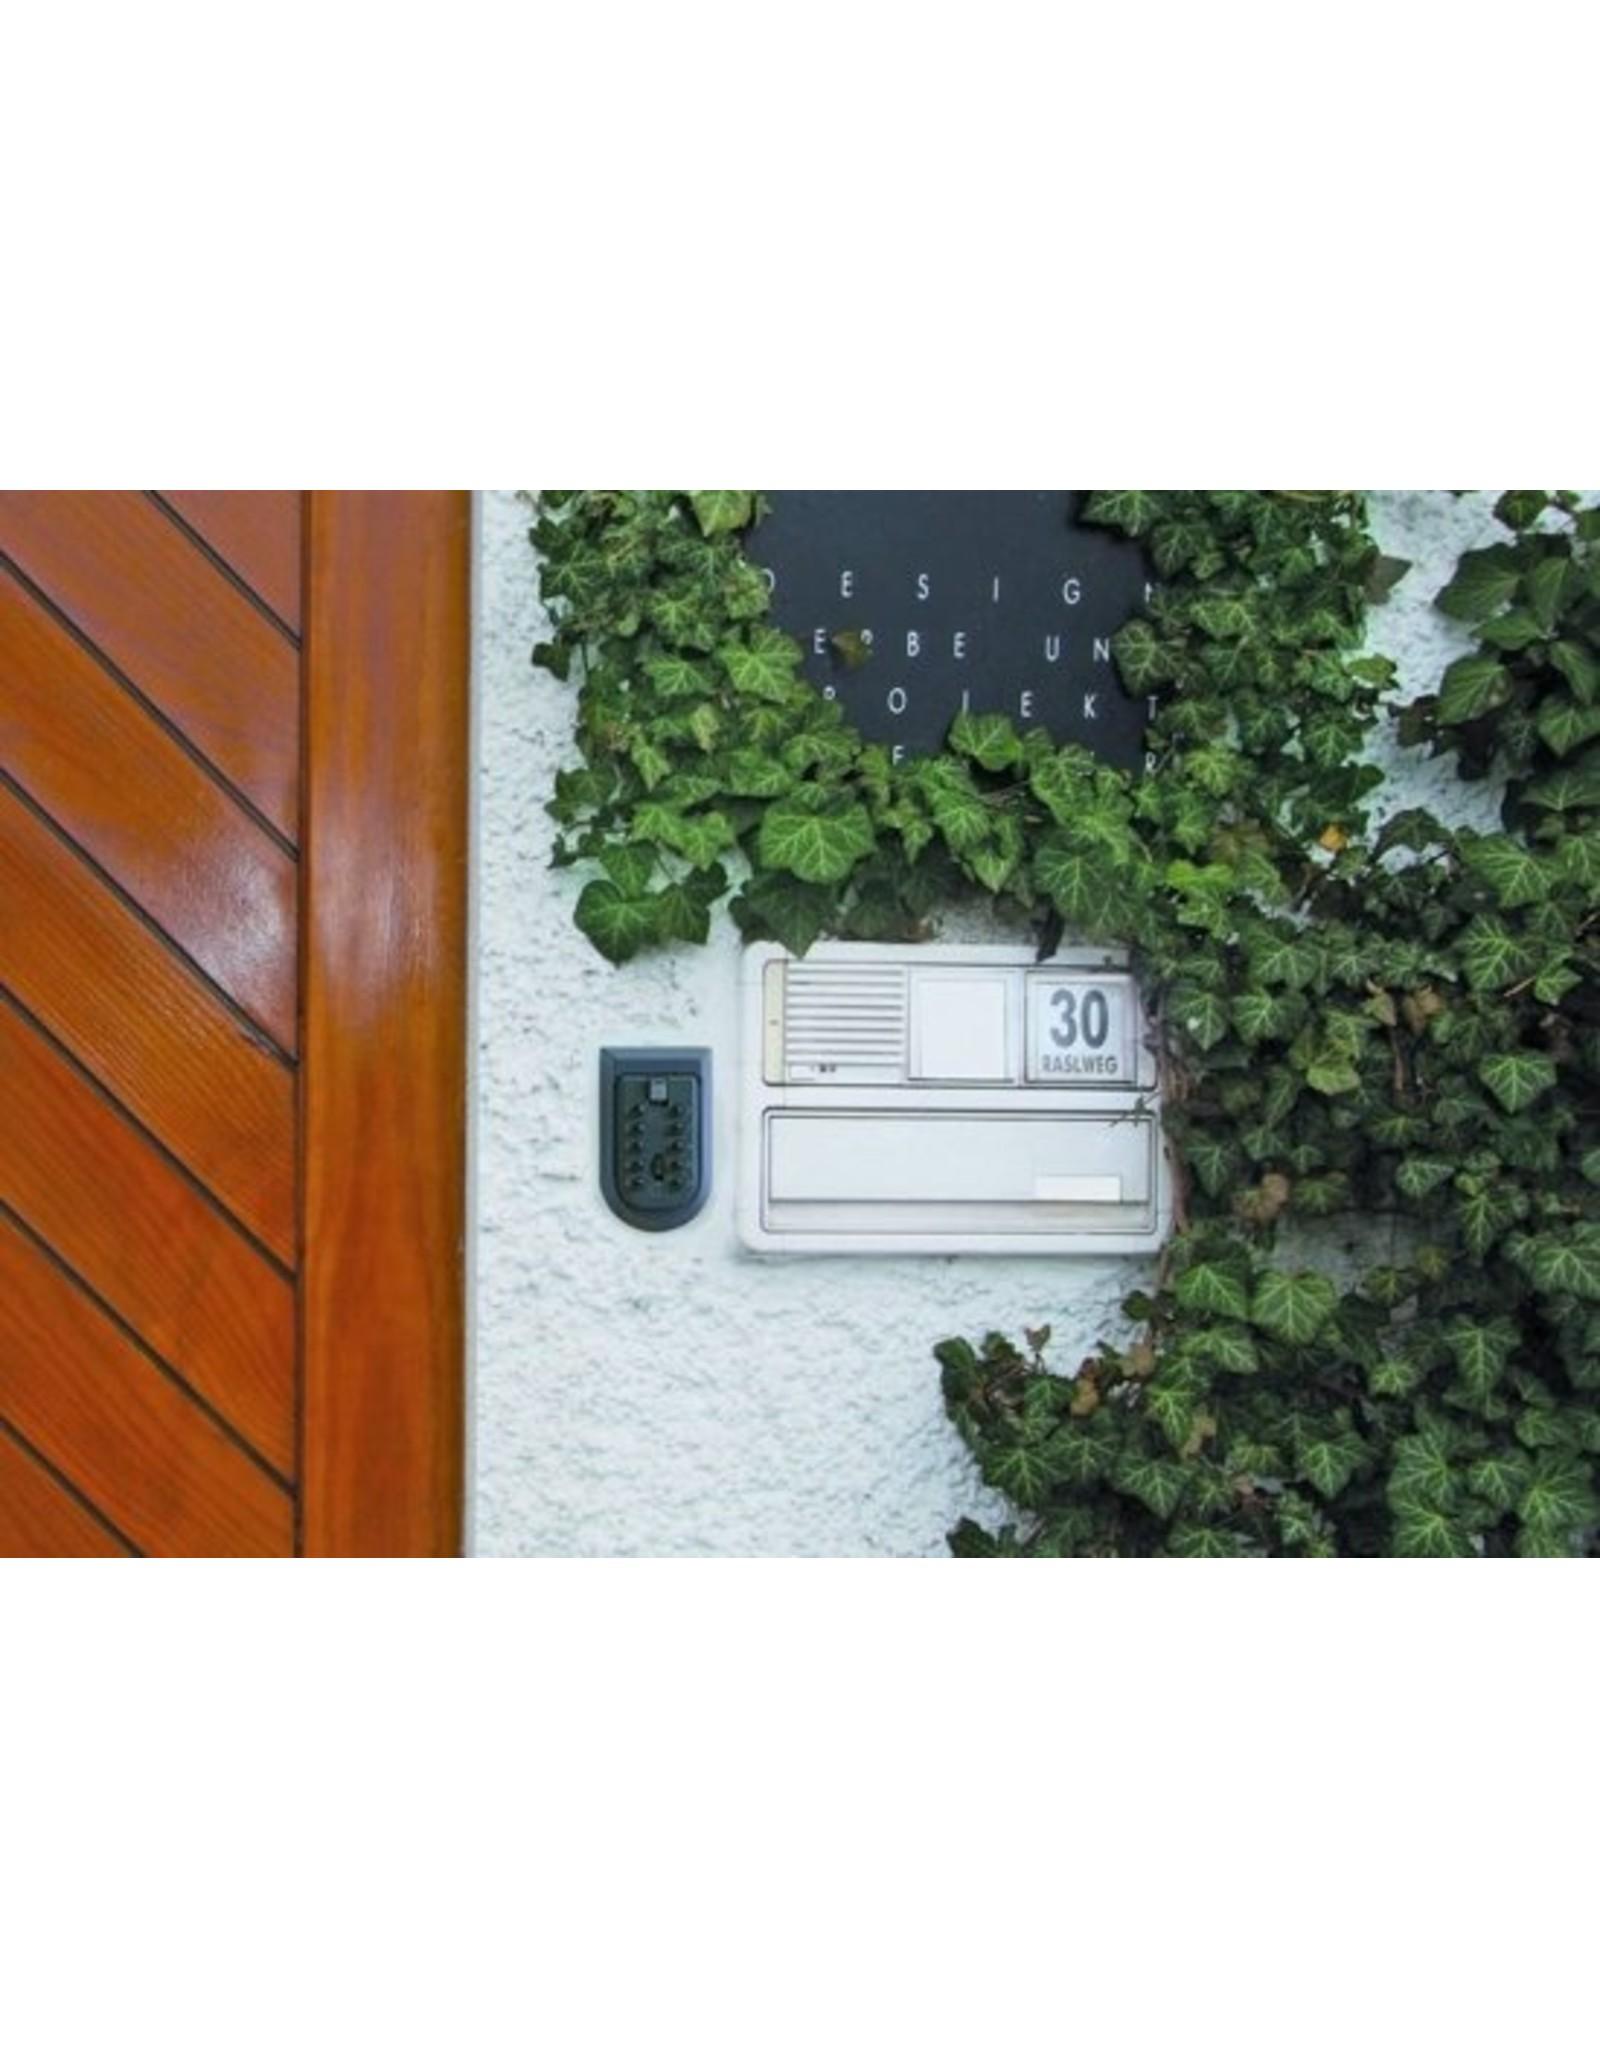 Parya Official  Key safe for 5 keys